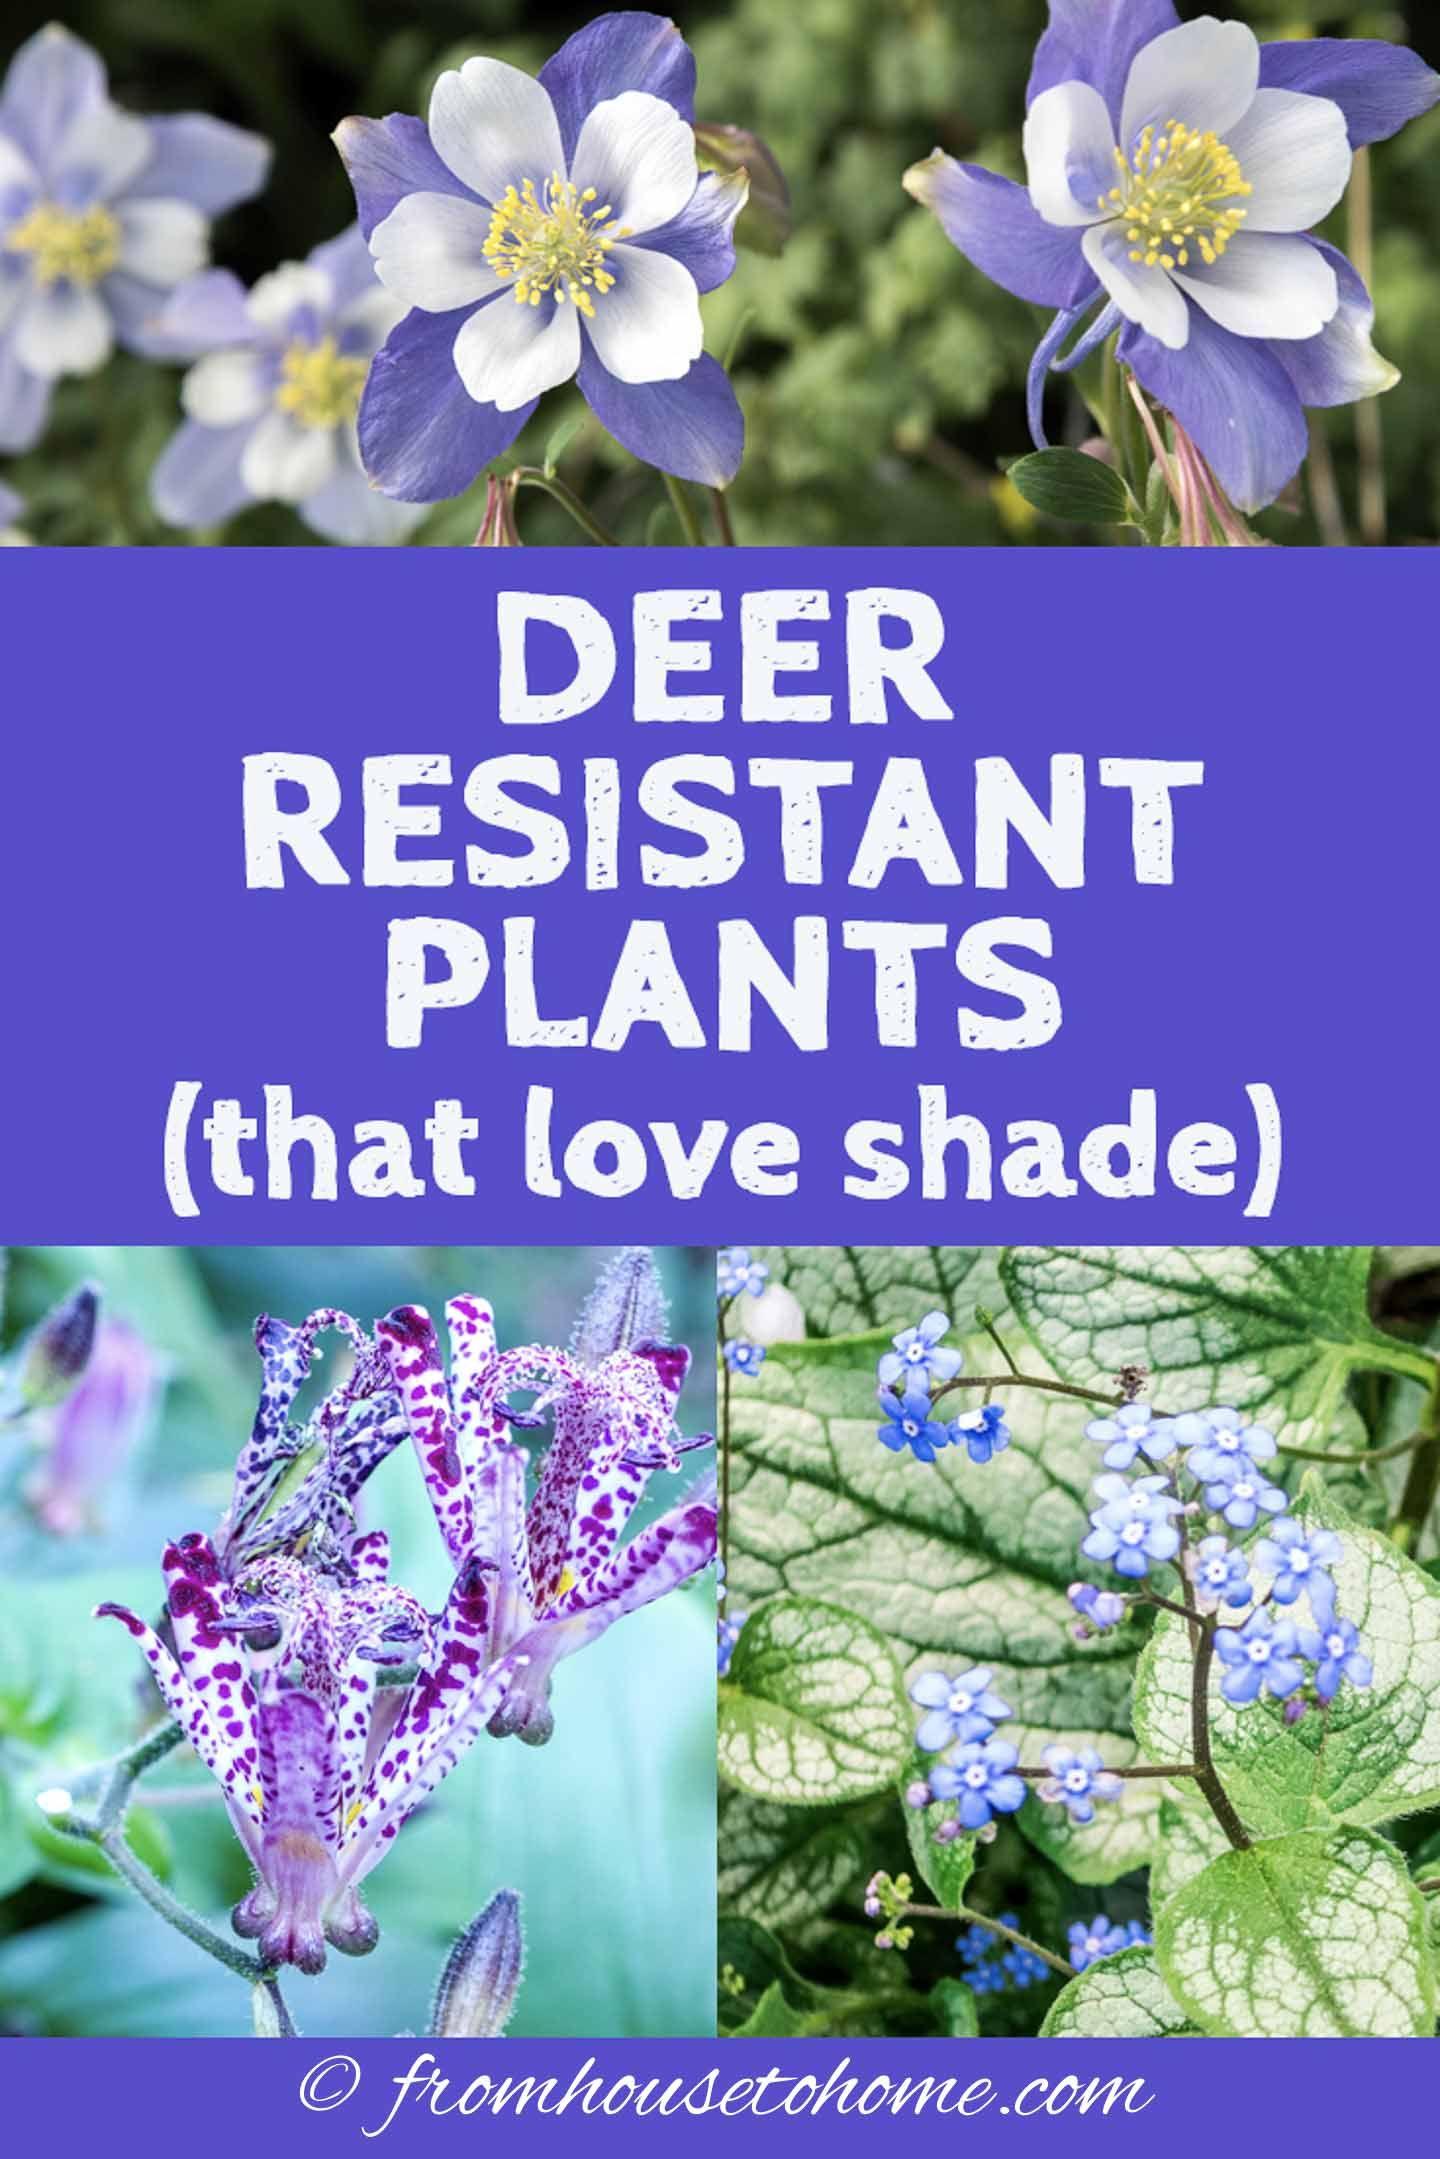 15 Beautiful Deer Resistant Shade Plants To Grow In Your Garden Plants That Love Shade Deer Resistant Shade Plants Shade Plants